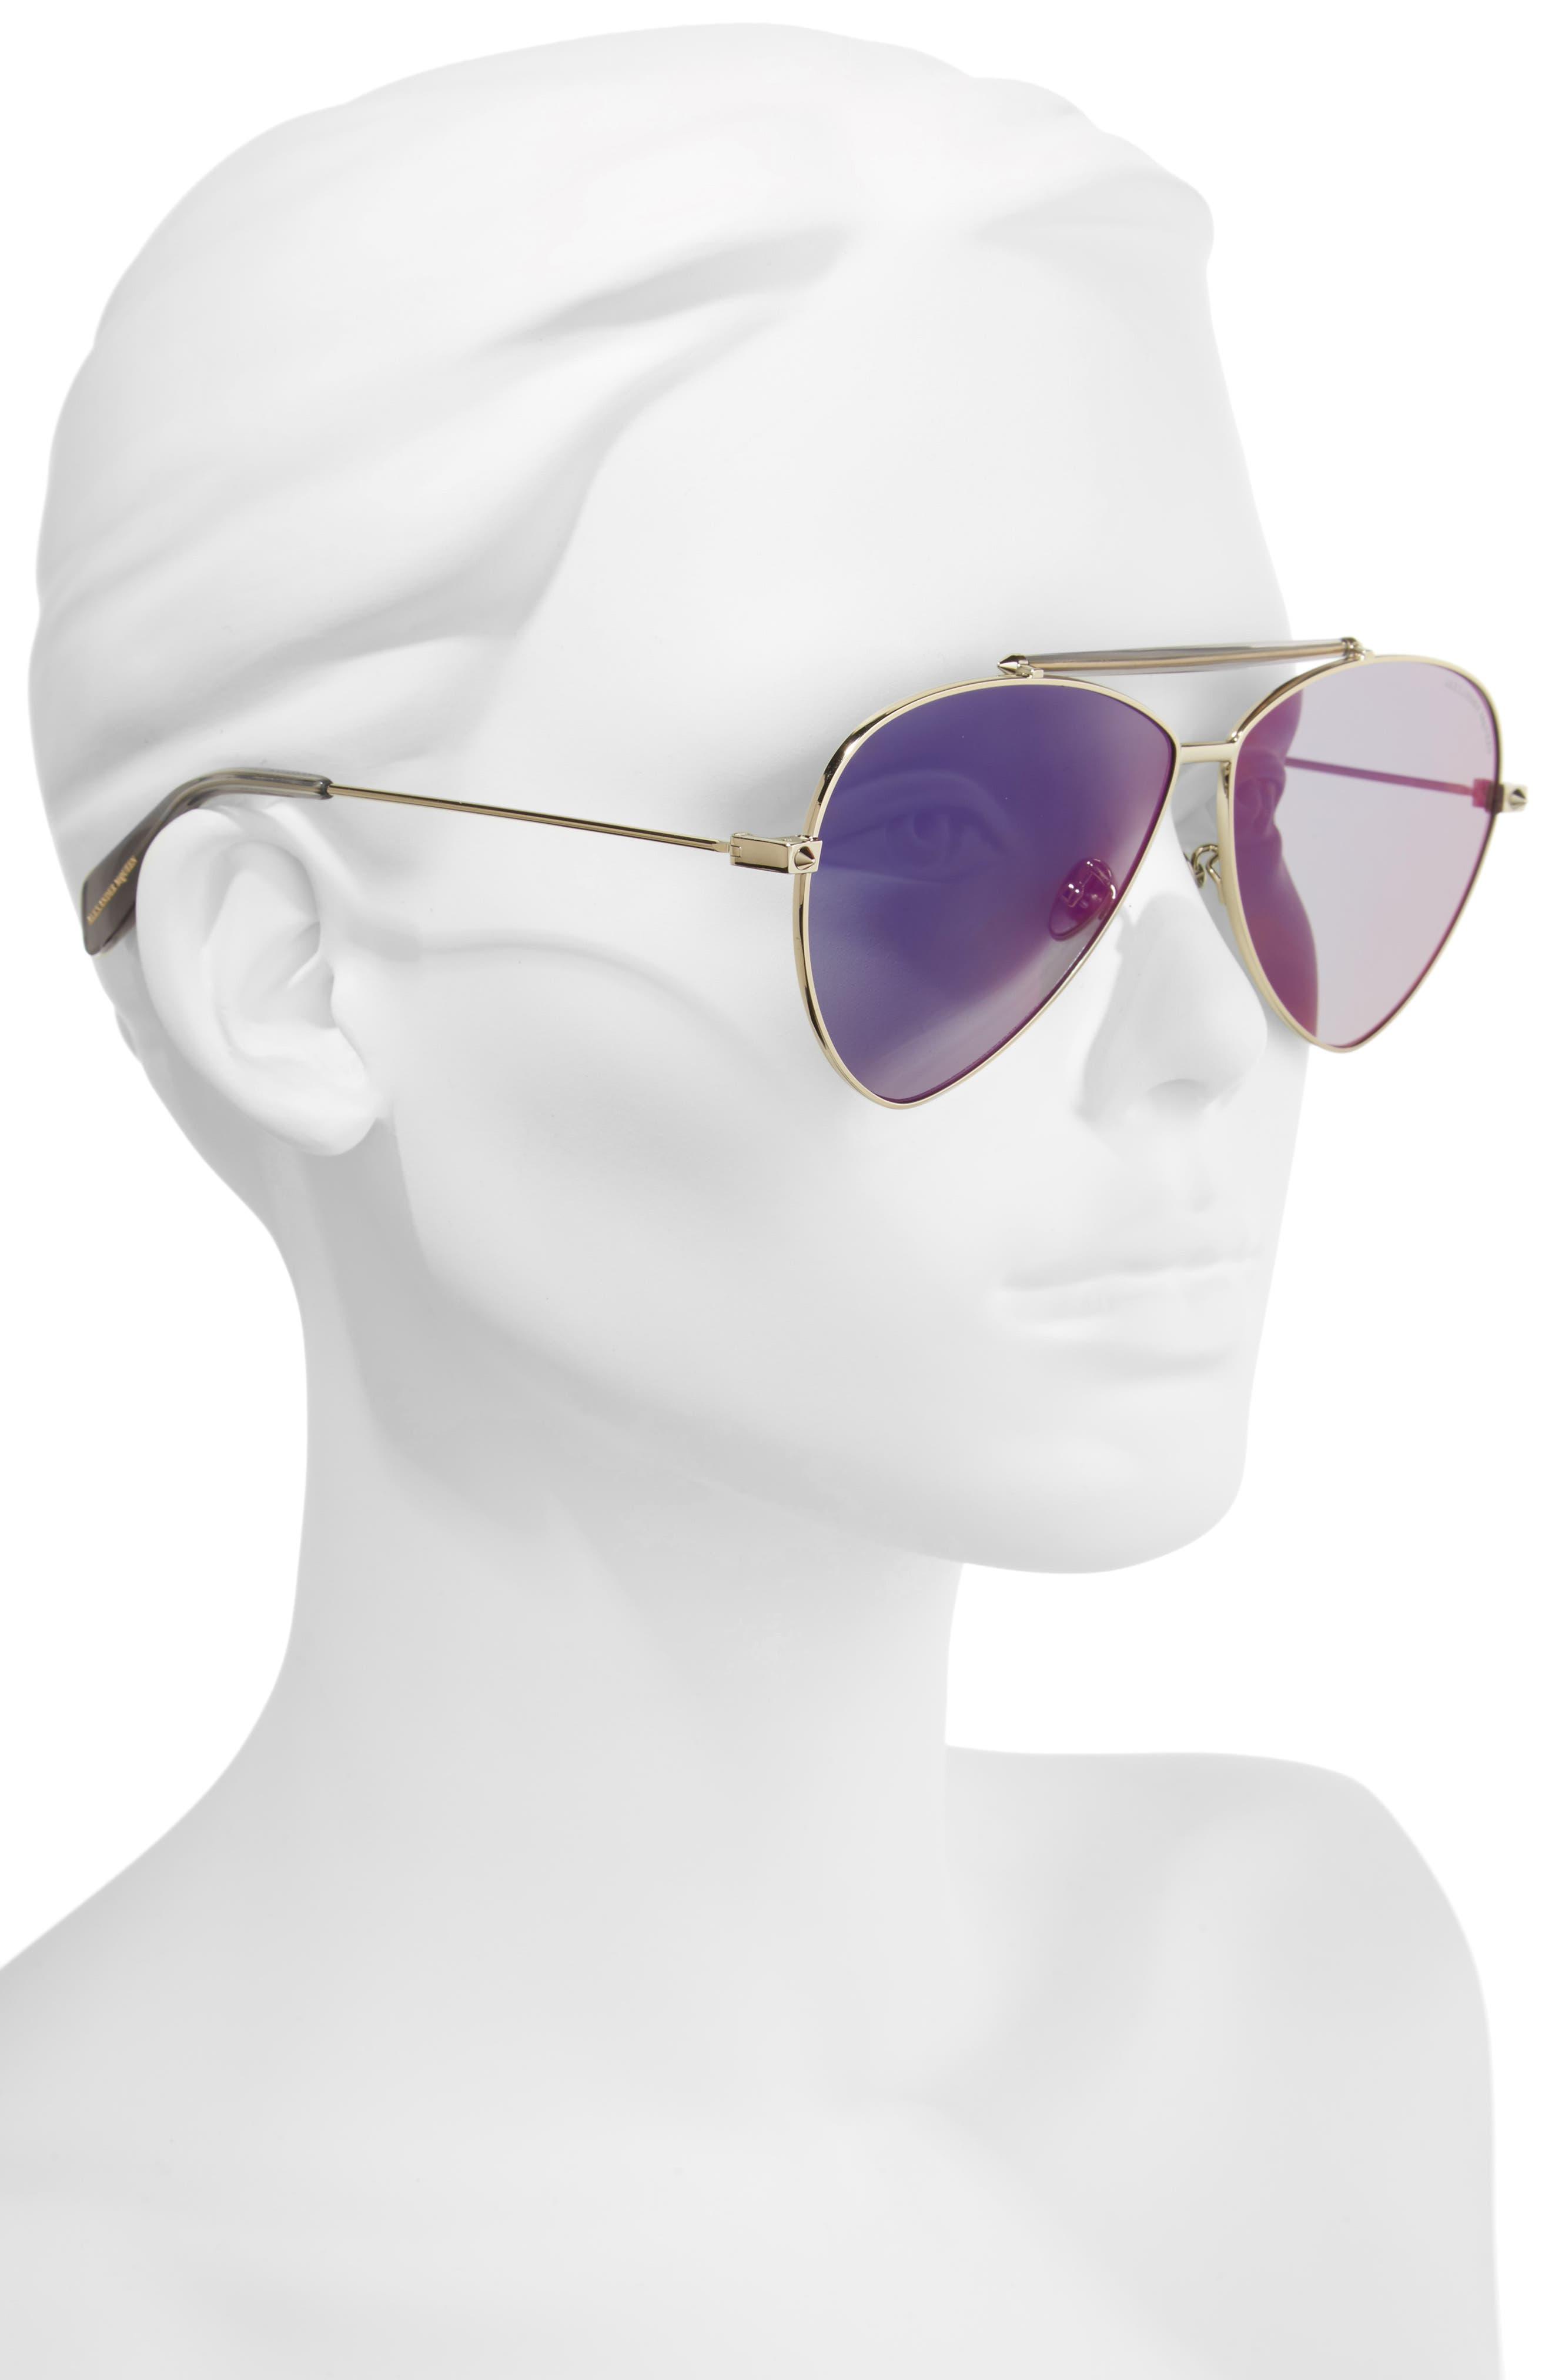 63mm Oversize Aviator Sunglasses,                             Alternate thumbnail 4, color,